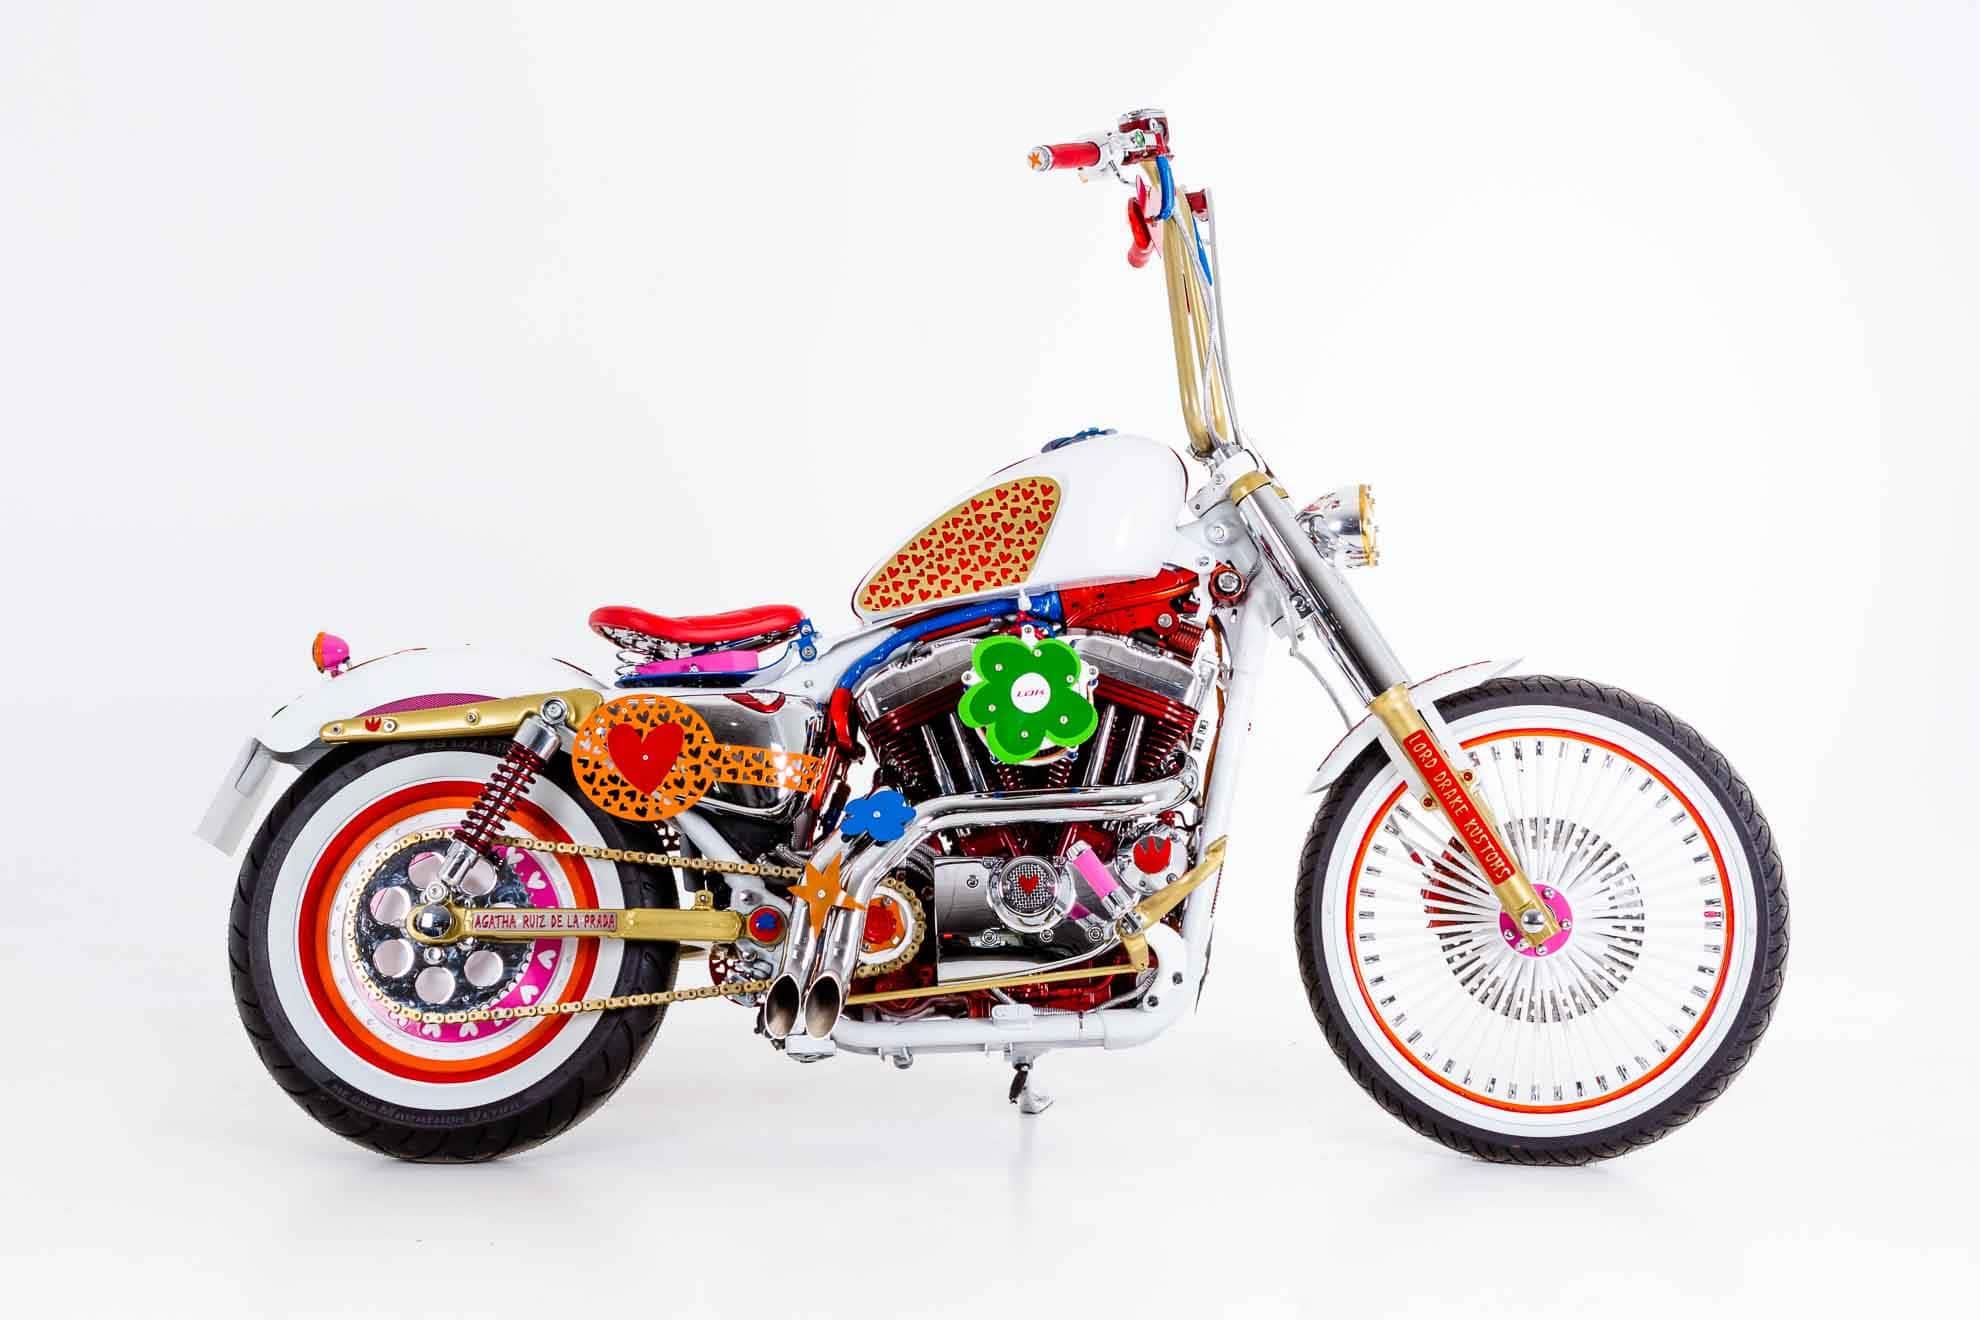 Harley Agatha Ruiz de la Prada by Lord Drake Kustoms